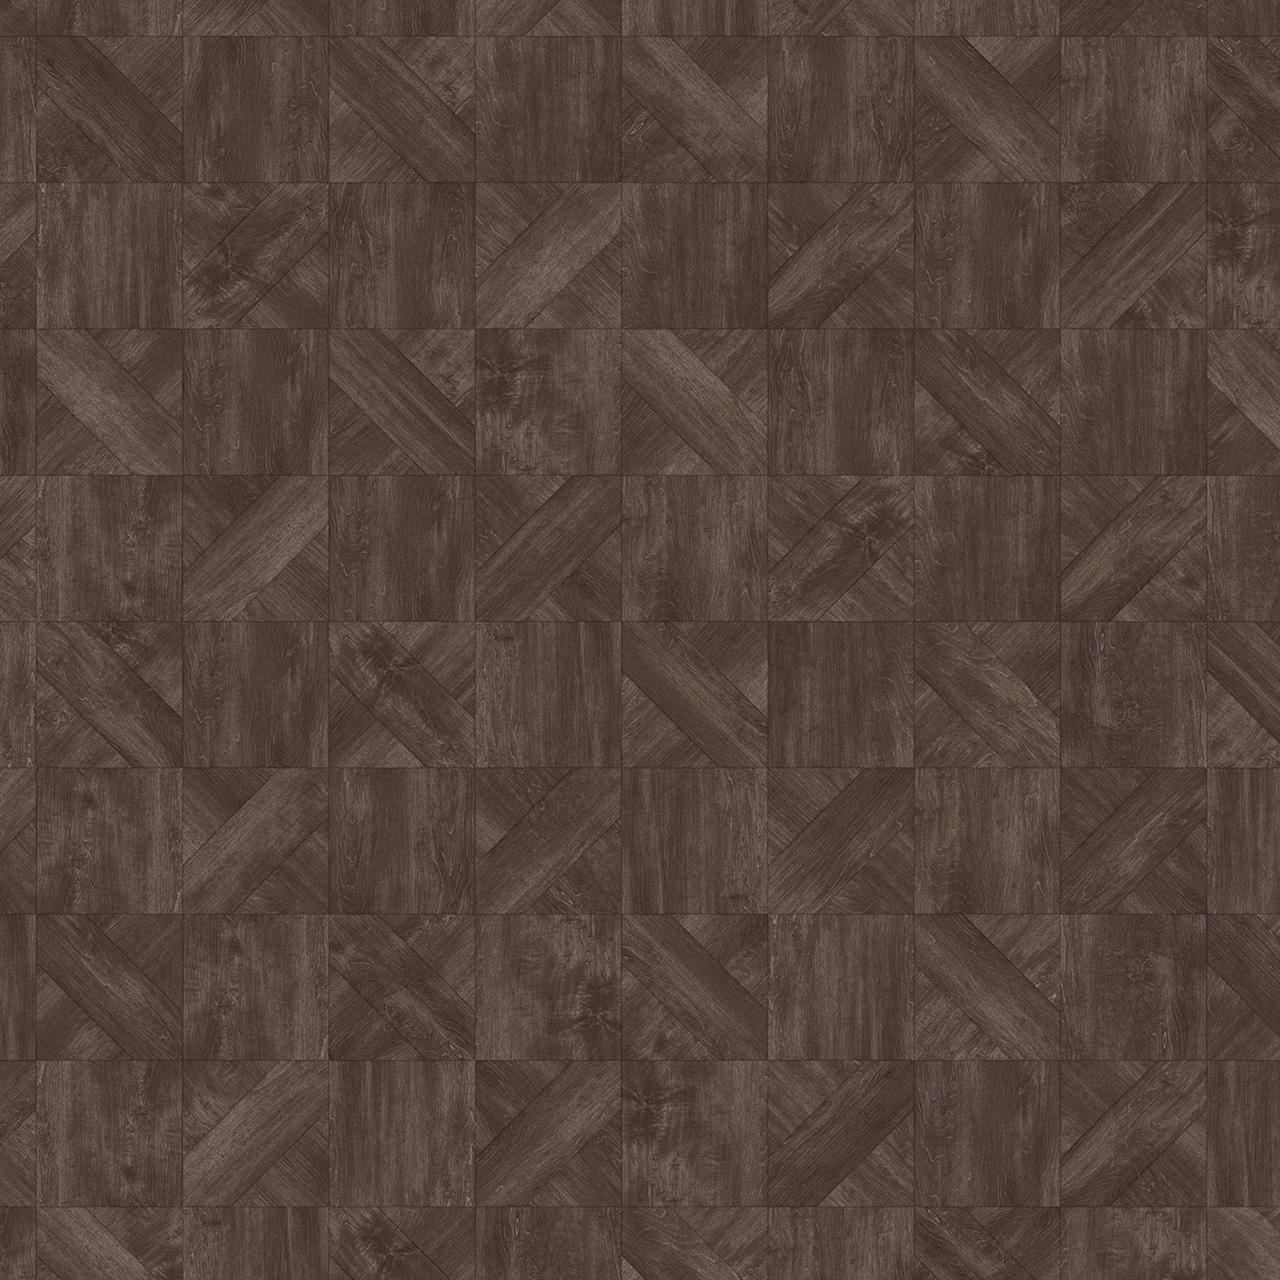 Designers 39 Choice Woven Luxury Vinyl Flooring Tiles